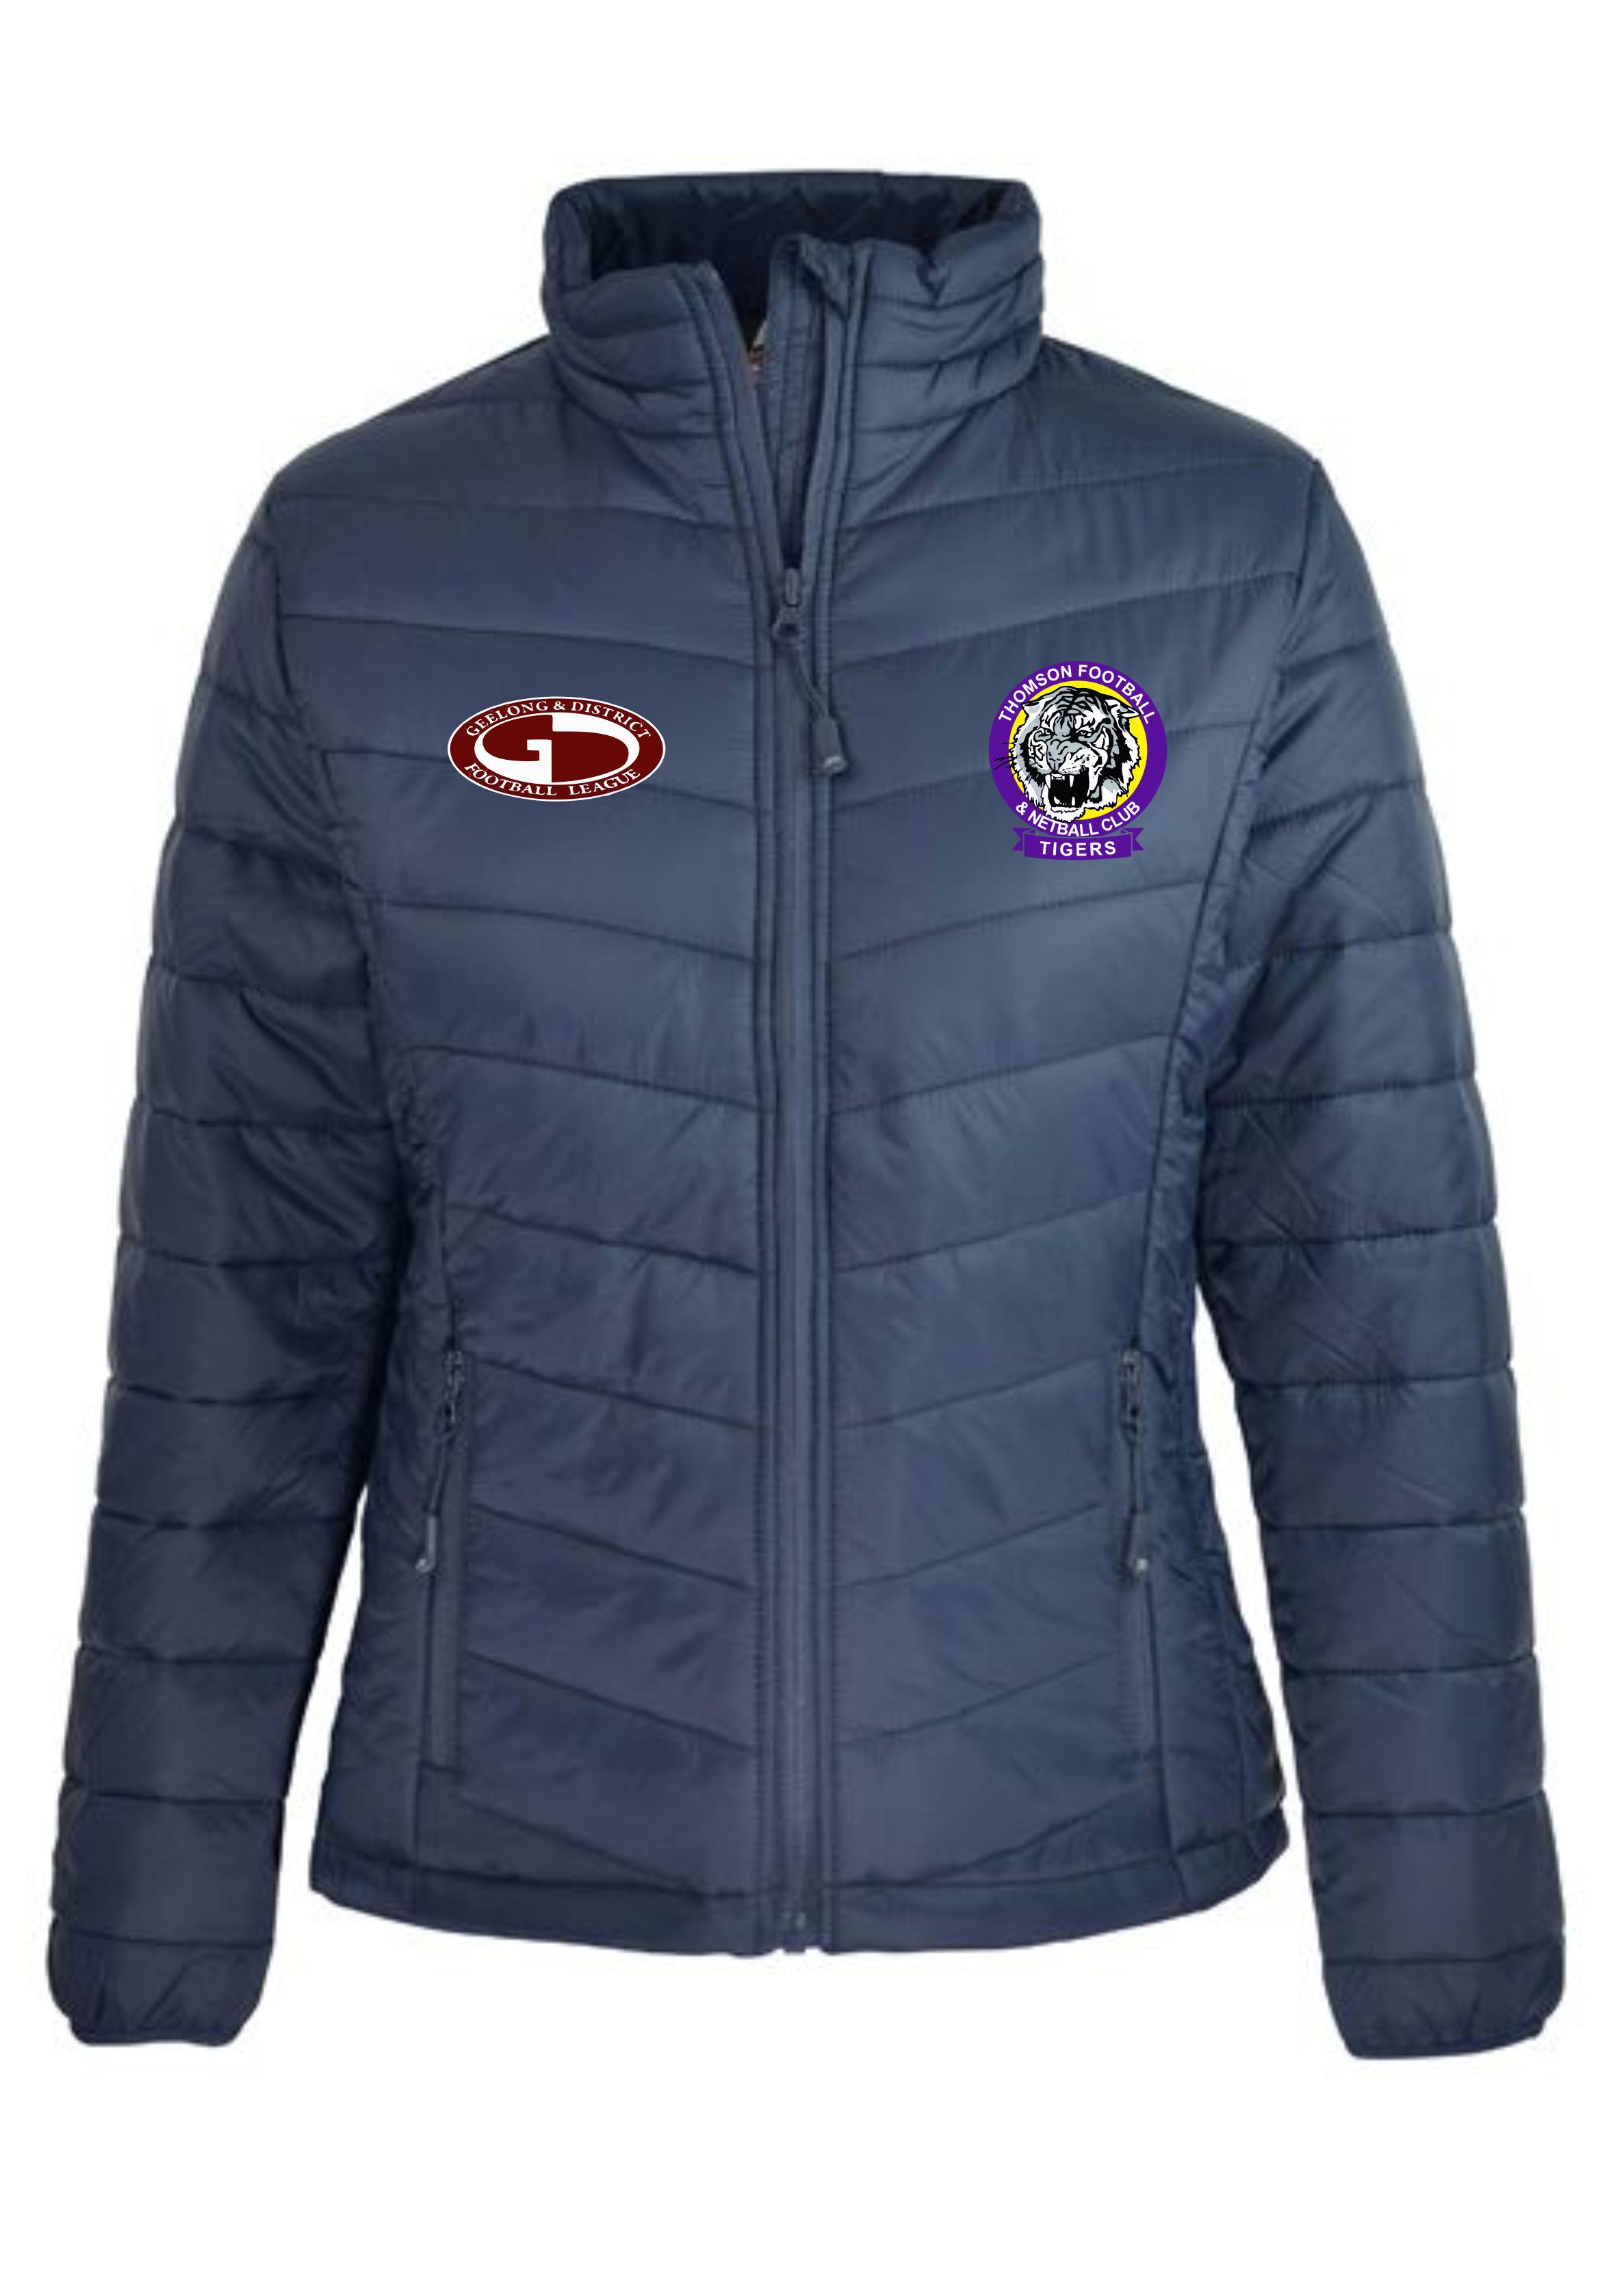 Ladies Navy Puffer Jacket